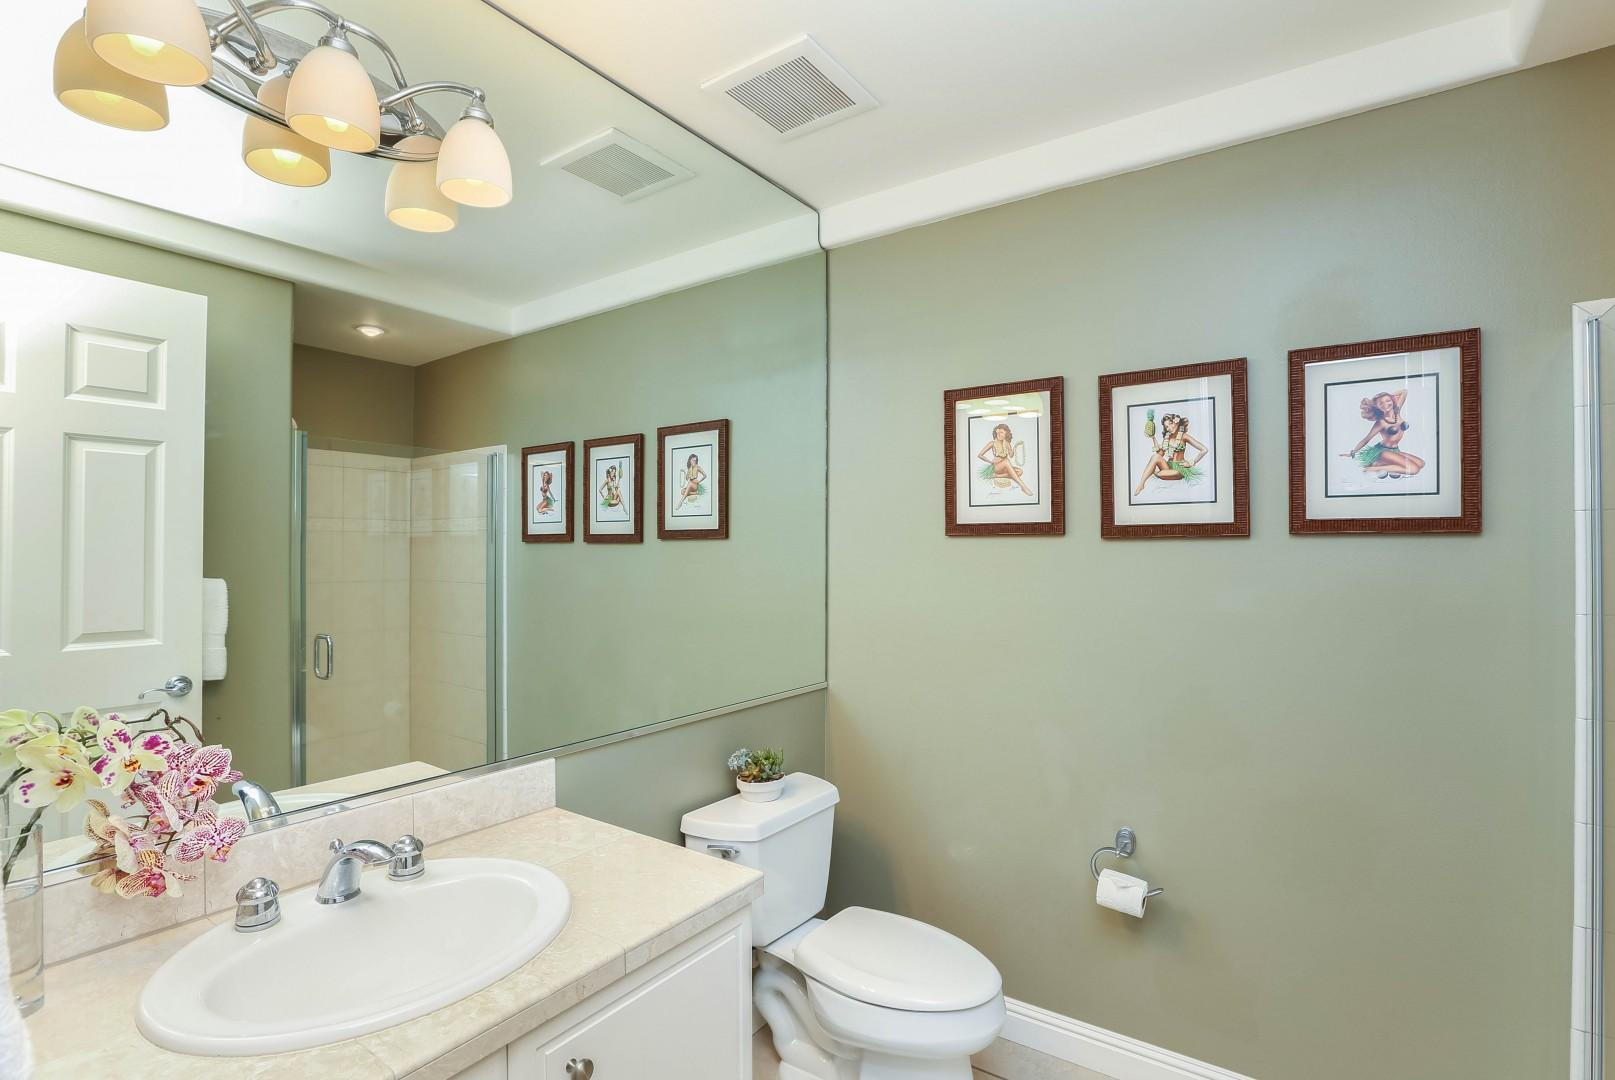 Guest Hallway Full Bathroom with Shower